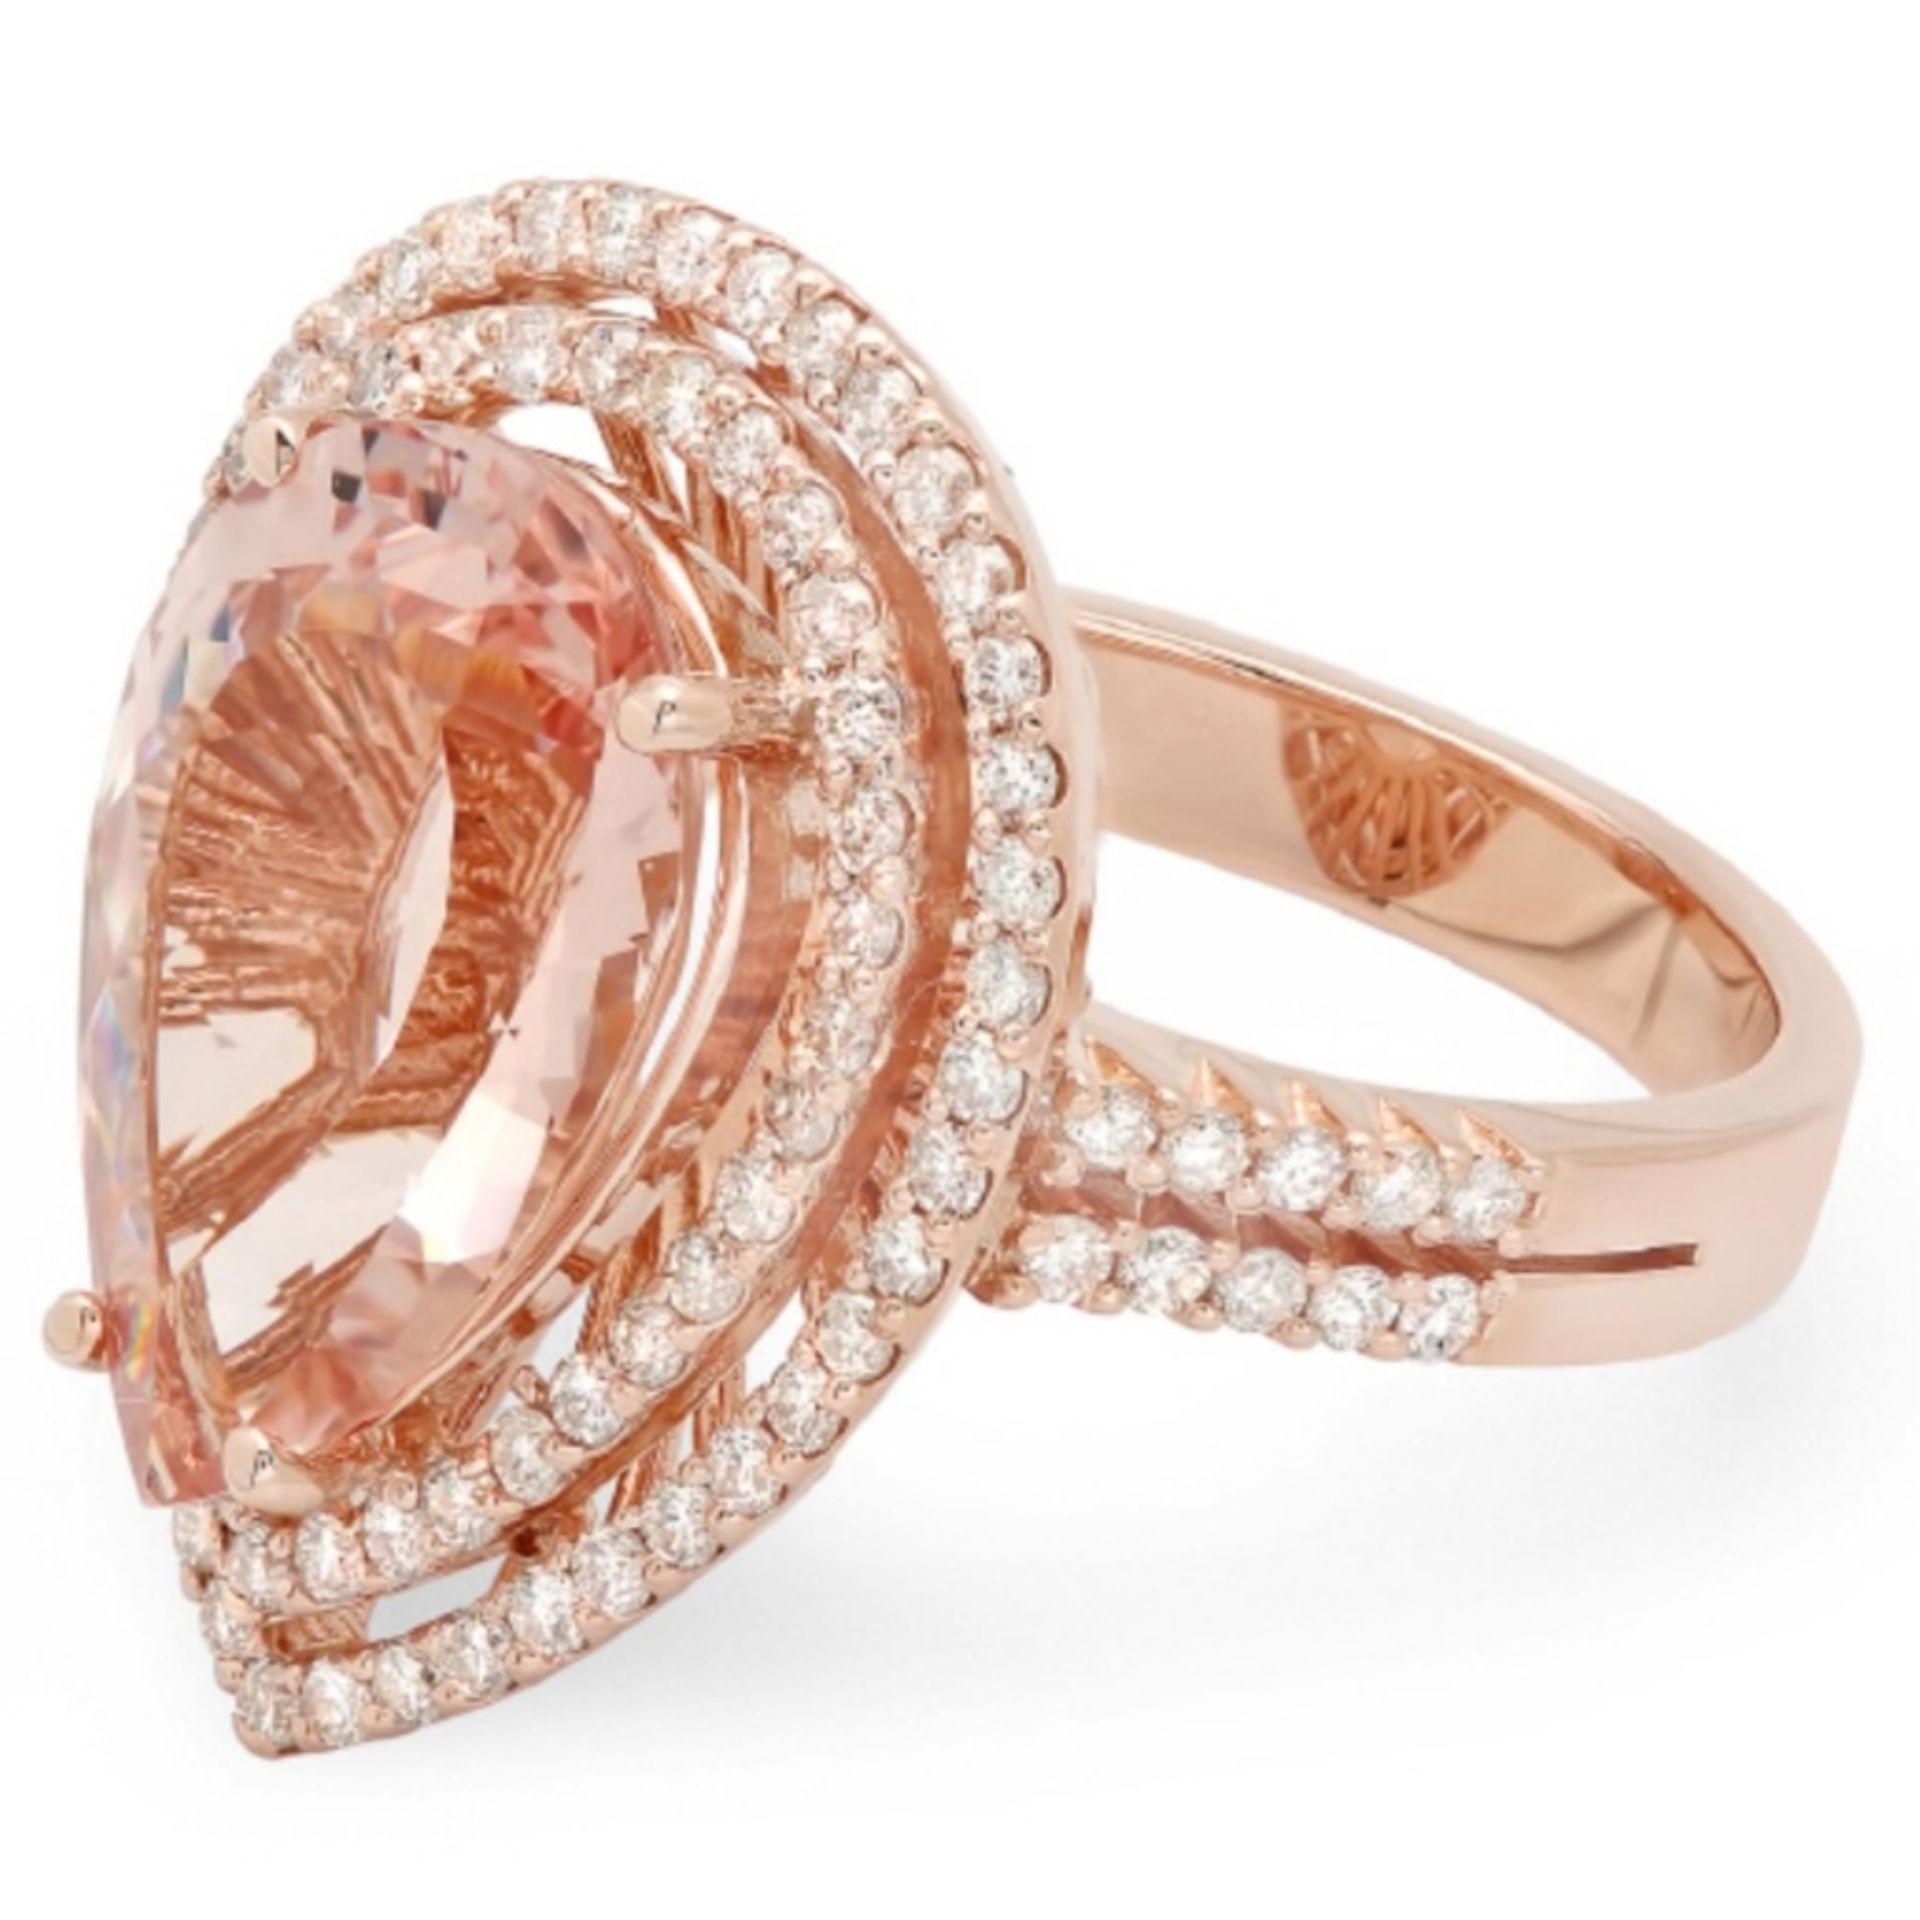 14K Gold 6.00ct Morganite & 1.00ct Diamond Ring - Image 2 of 2